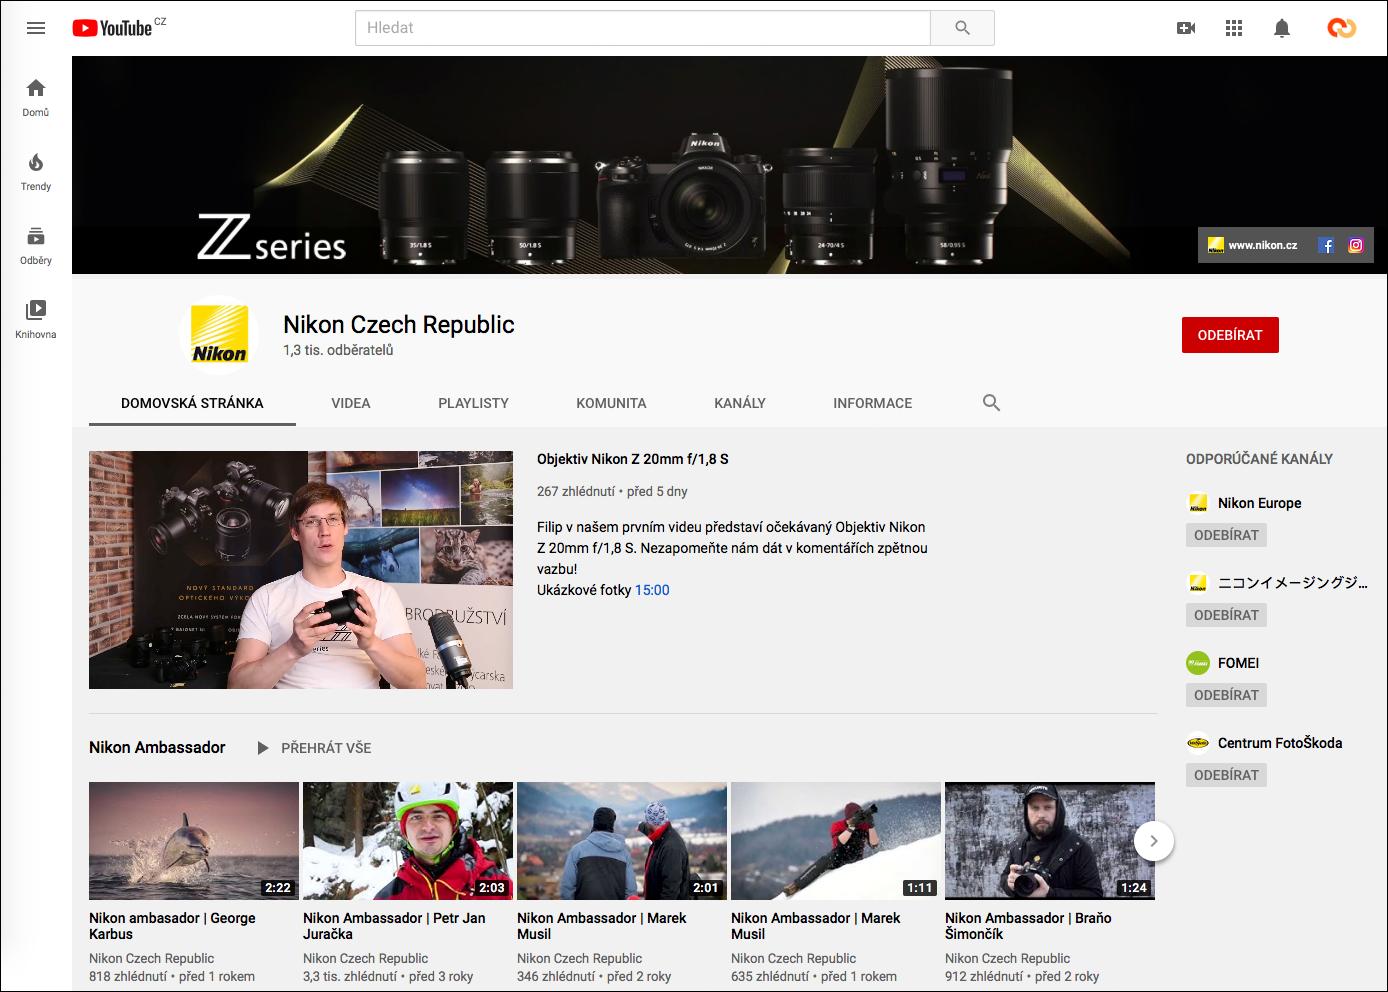 YouTube Nikon Czech Republic